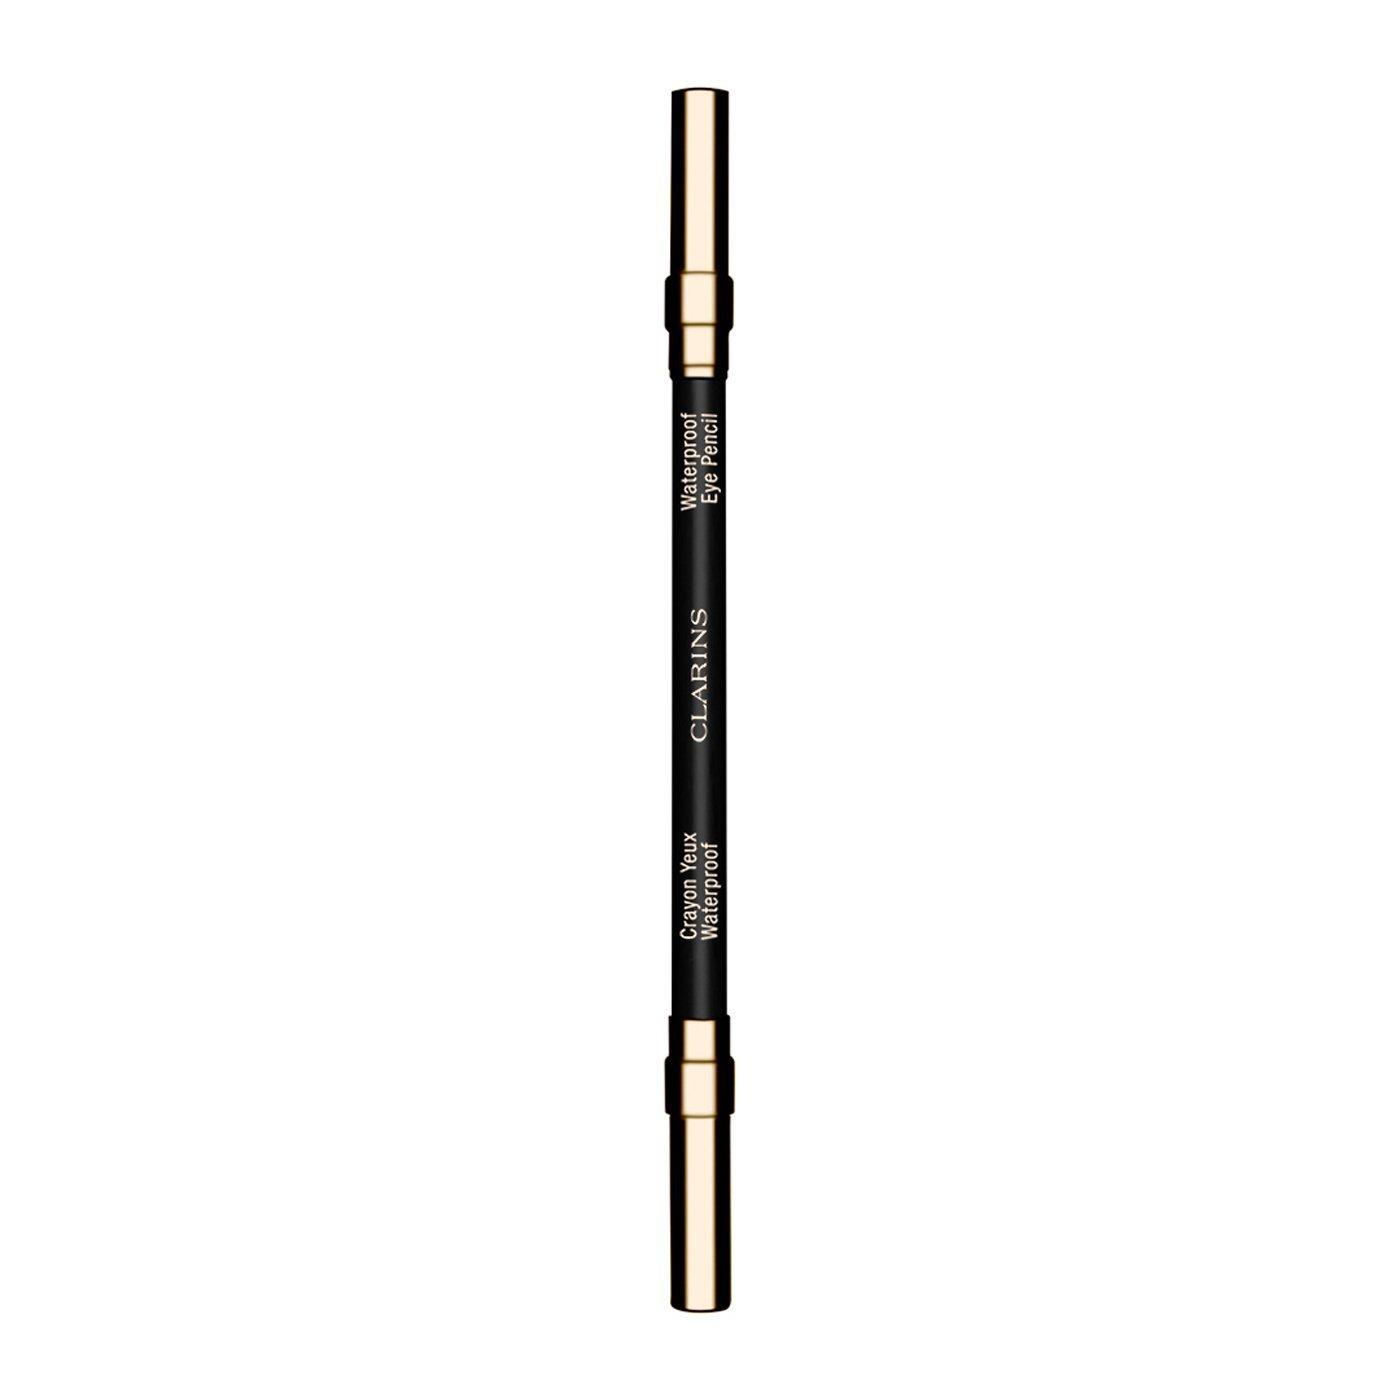 Clarins Waterproof Eye Pencil - 01 Black by Clarins (Image #1)